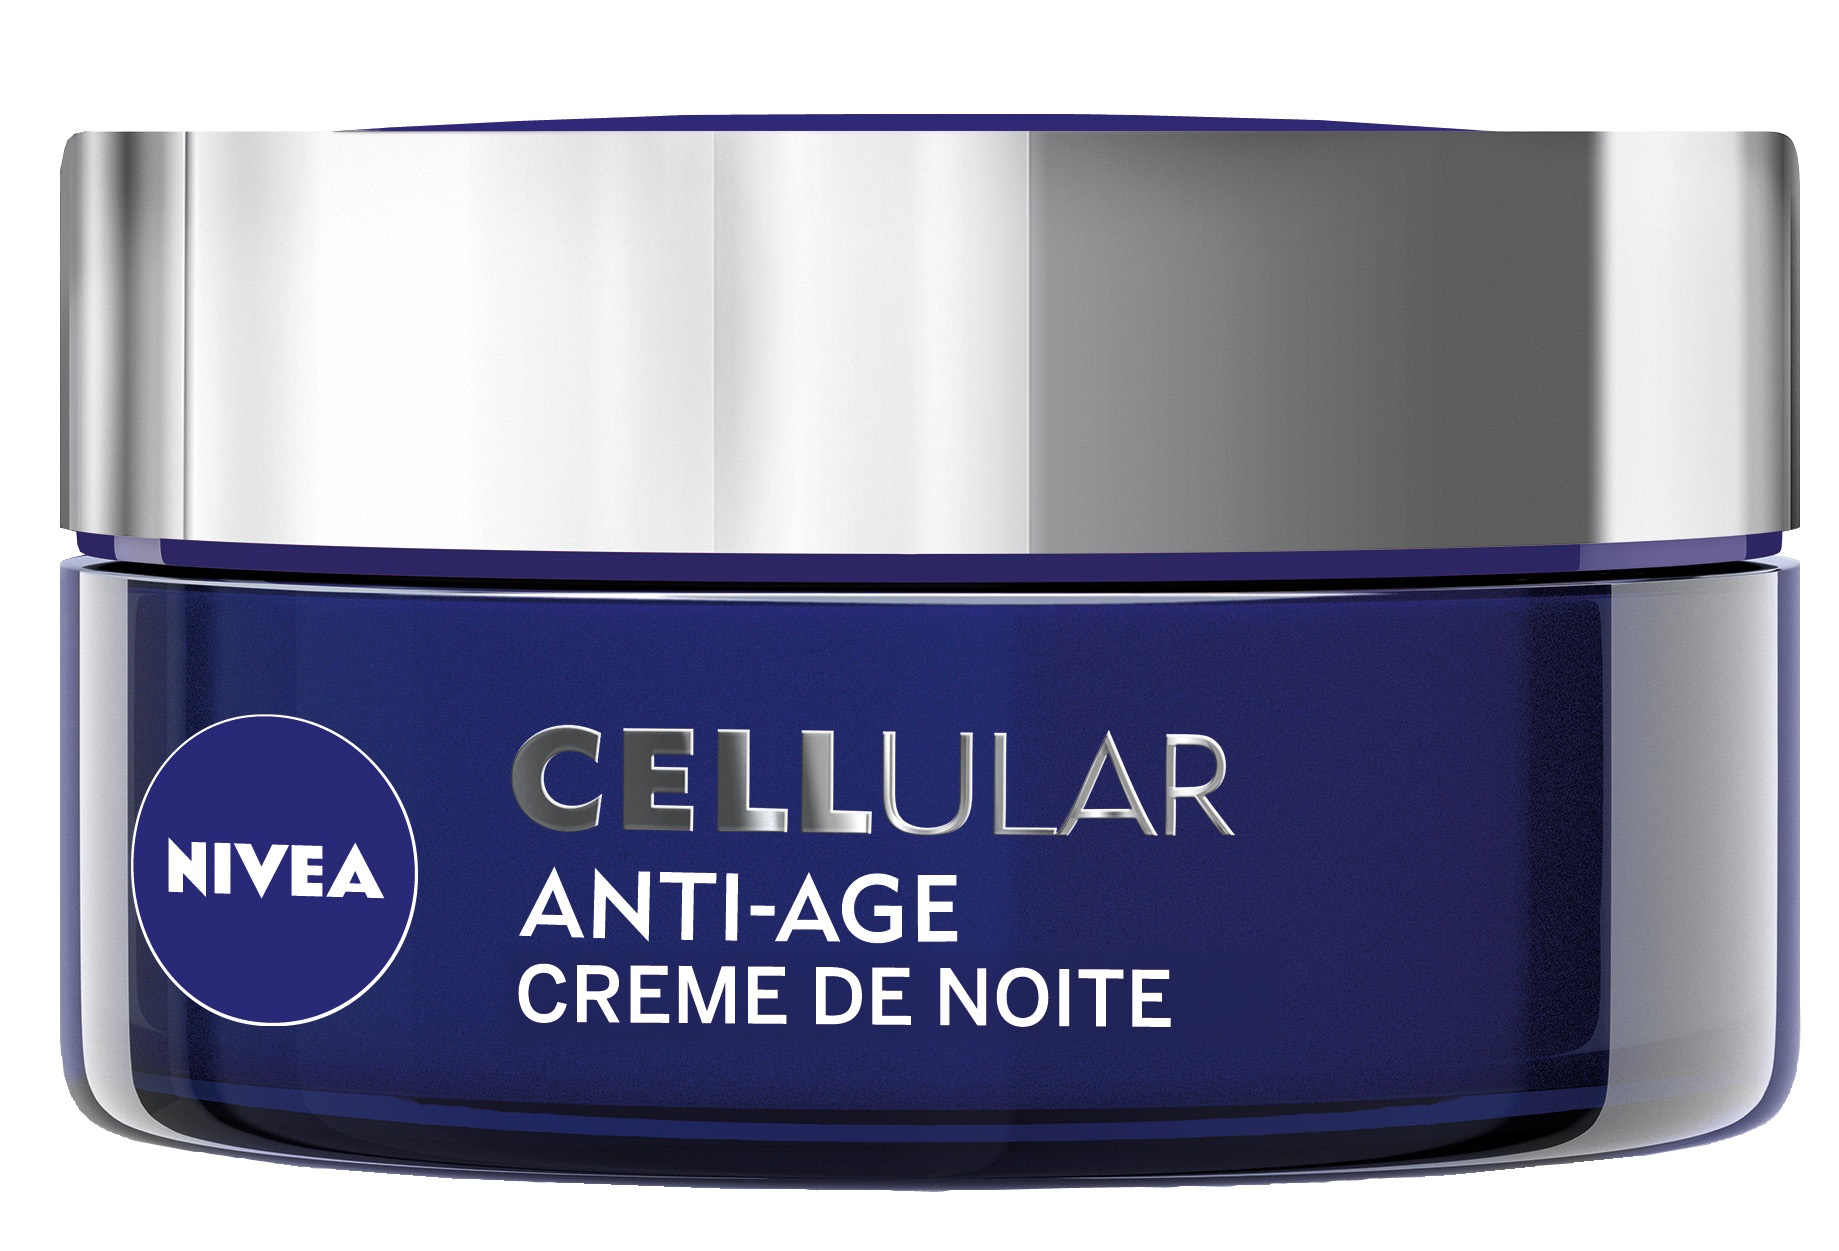 NIVEA CELLular Anti-Age Creme de Noite  (1)